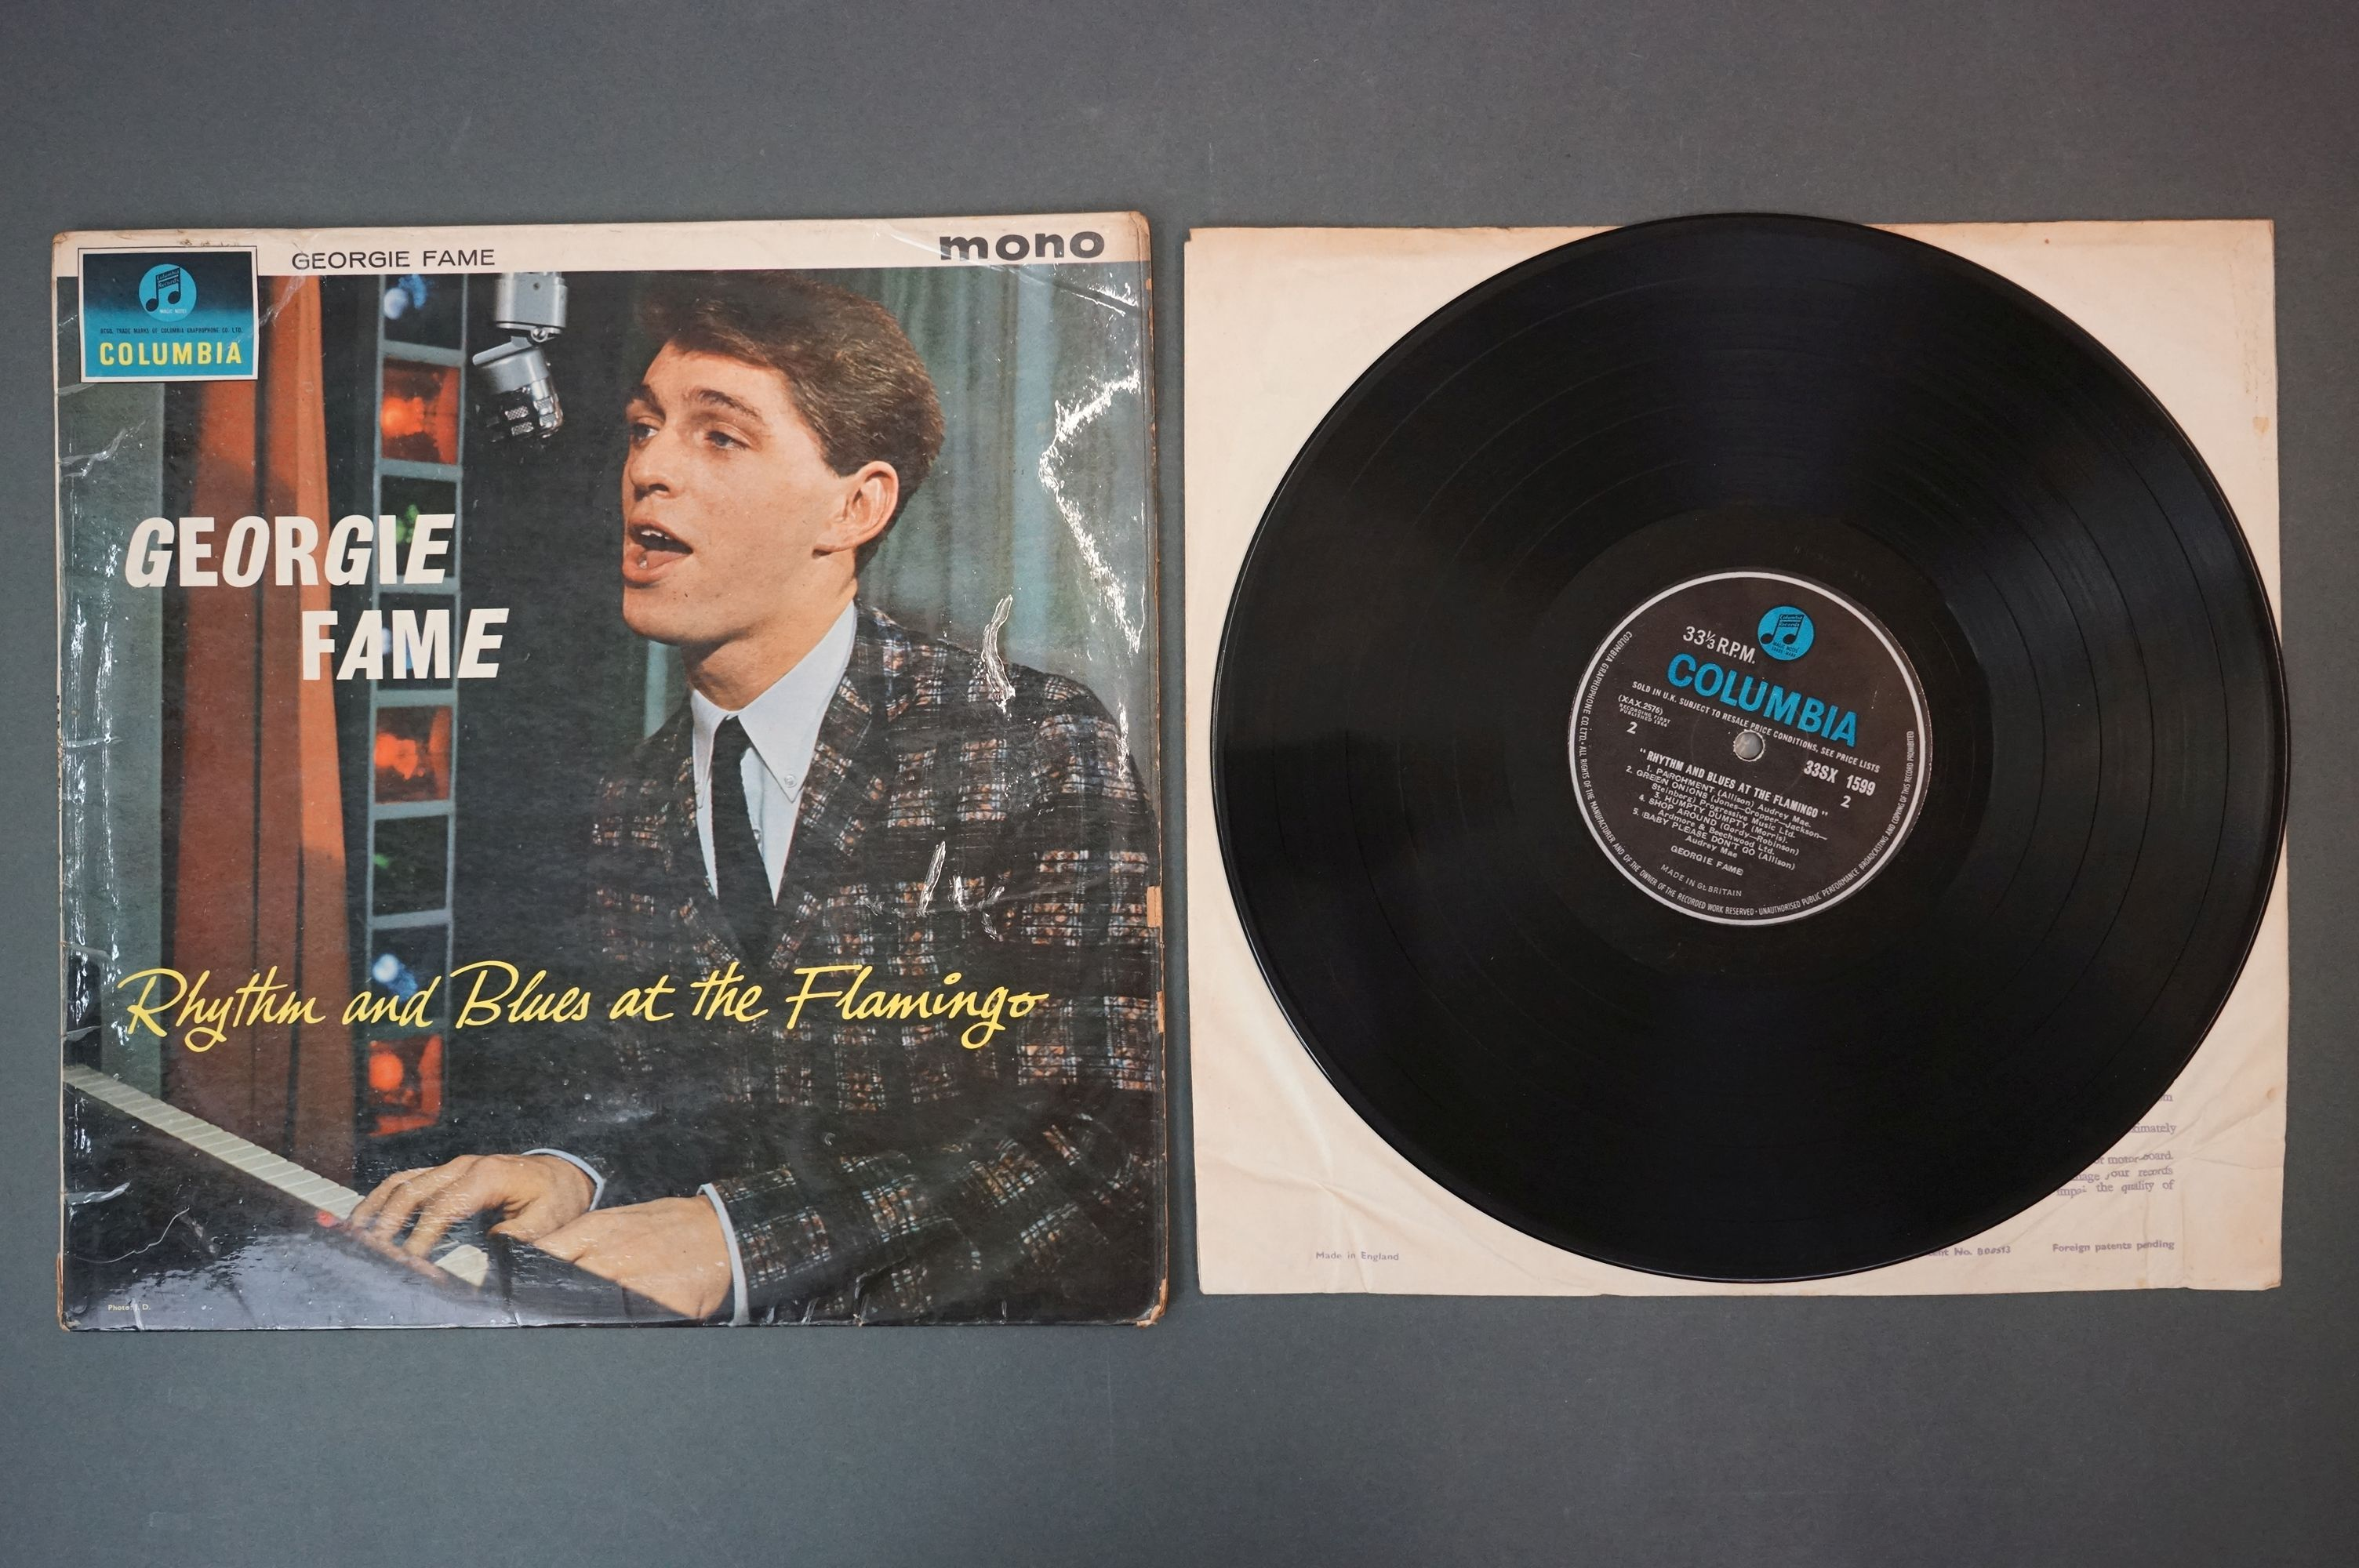 Vinyl - Georgie Fame Rhythm And Blues At The Flamingo (Columbia 33 SX 1599). Sleeve & Vinyl VG- - Image 2 of 4